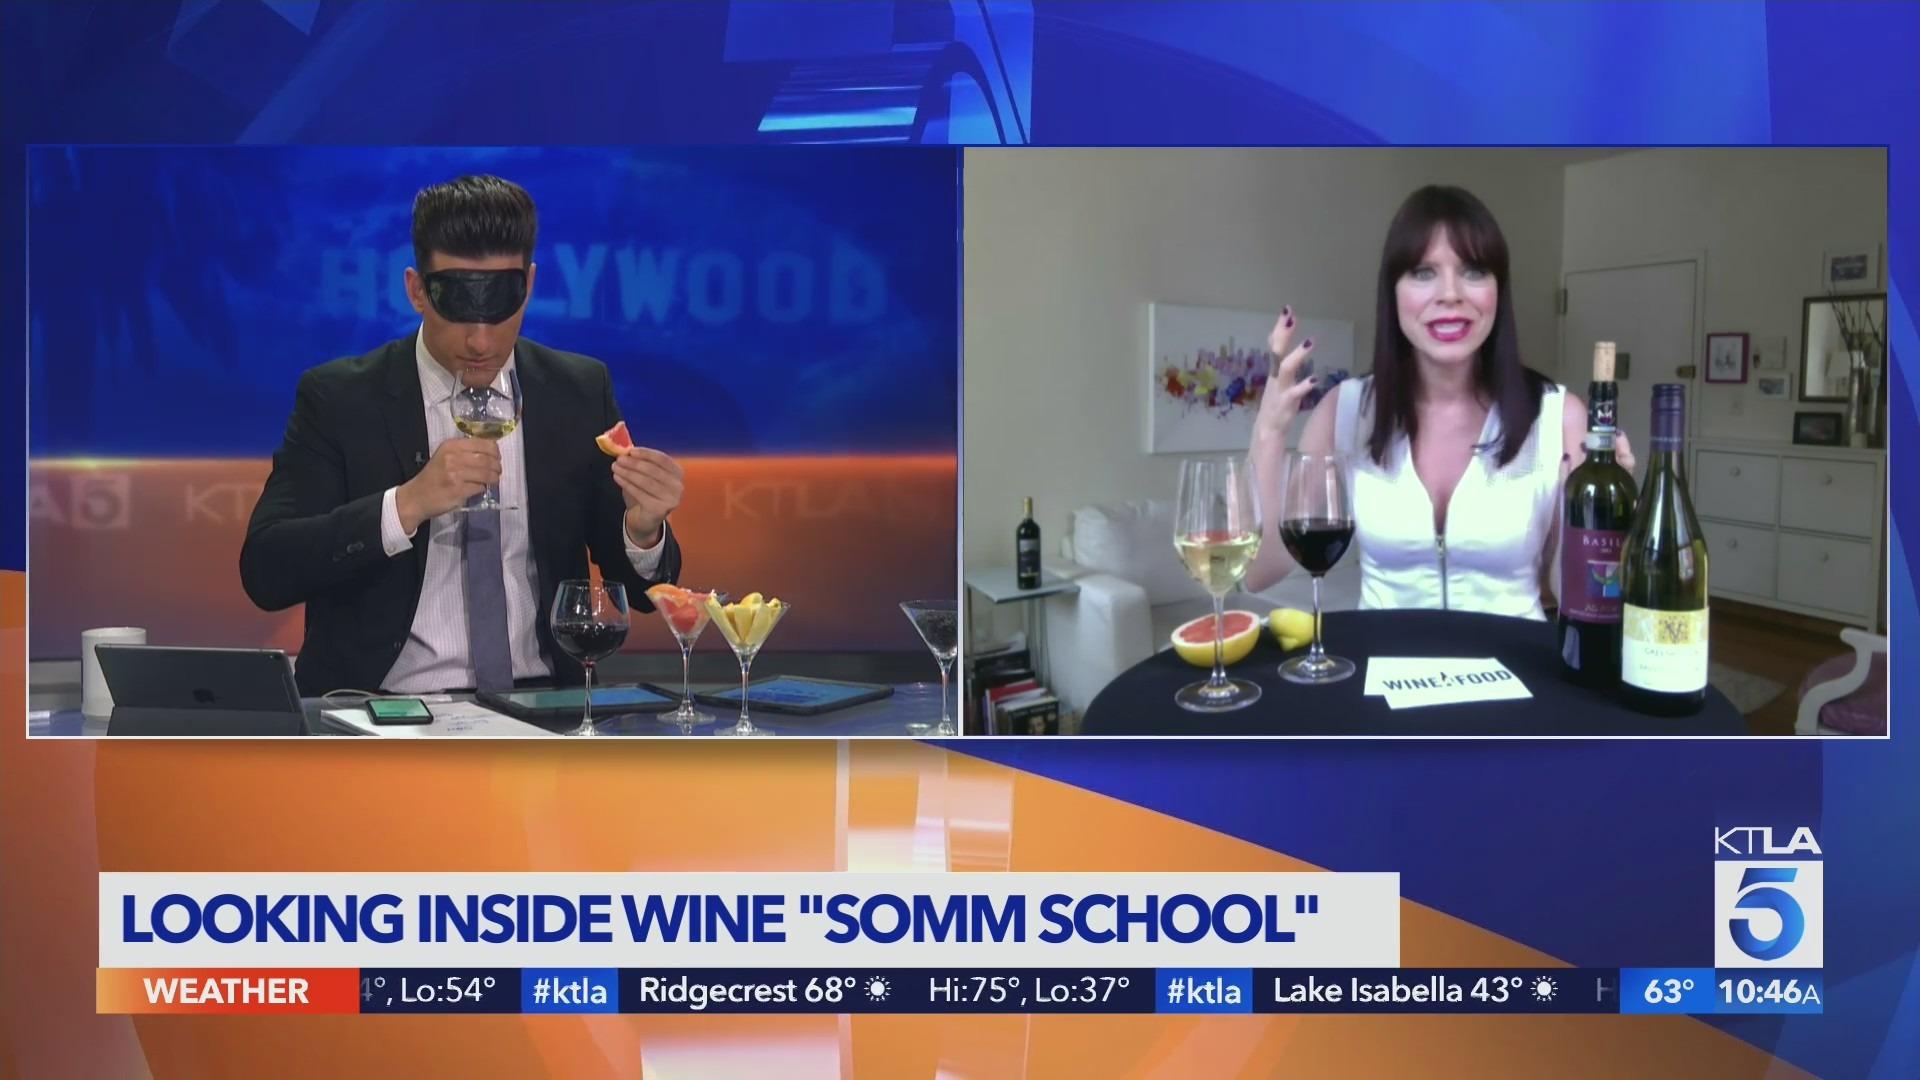 Somm School Insider takes us to wine school